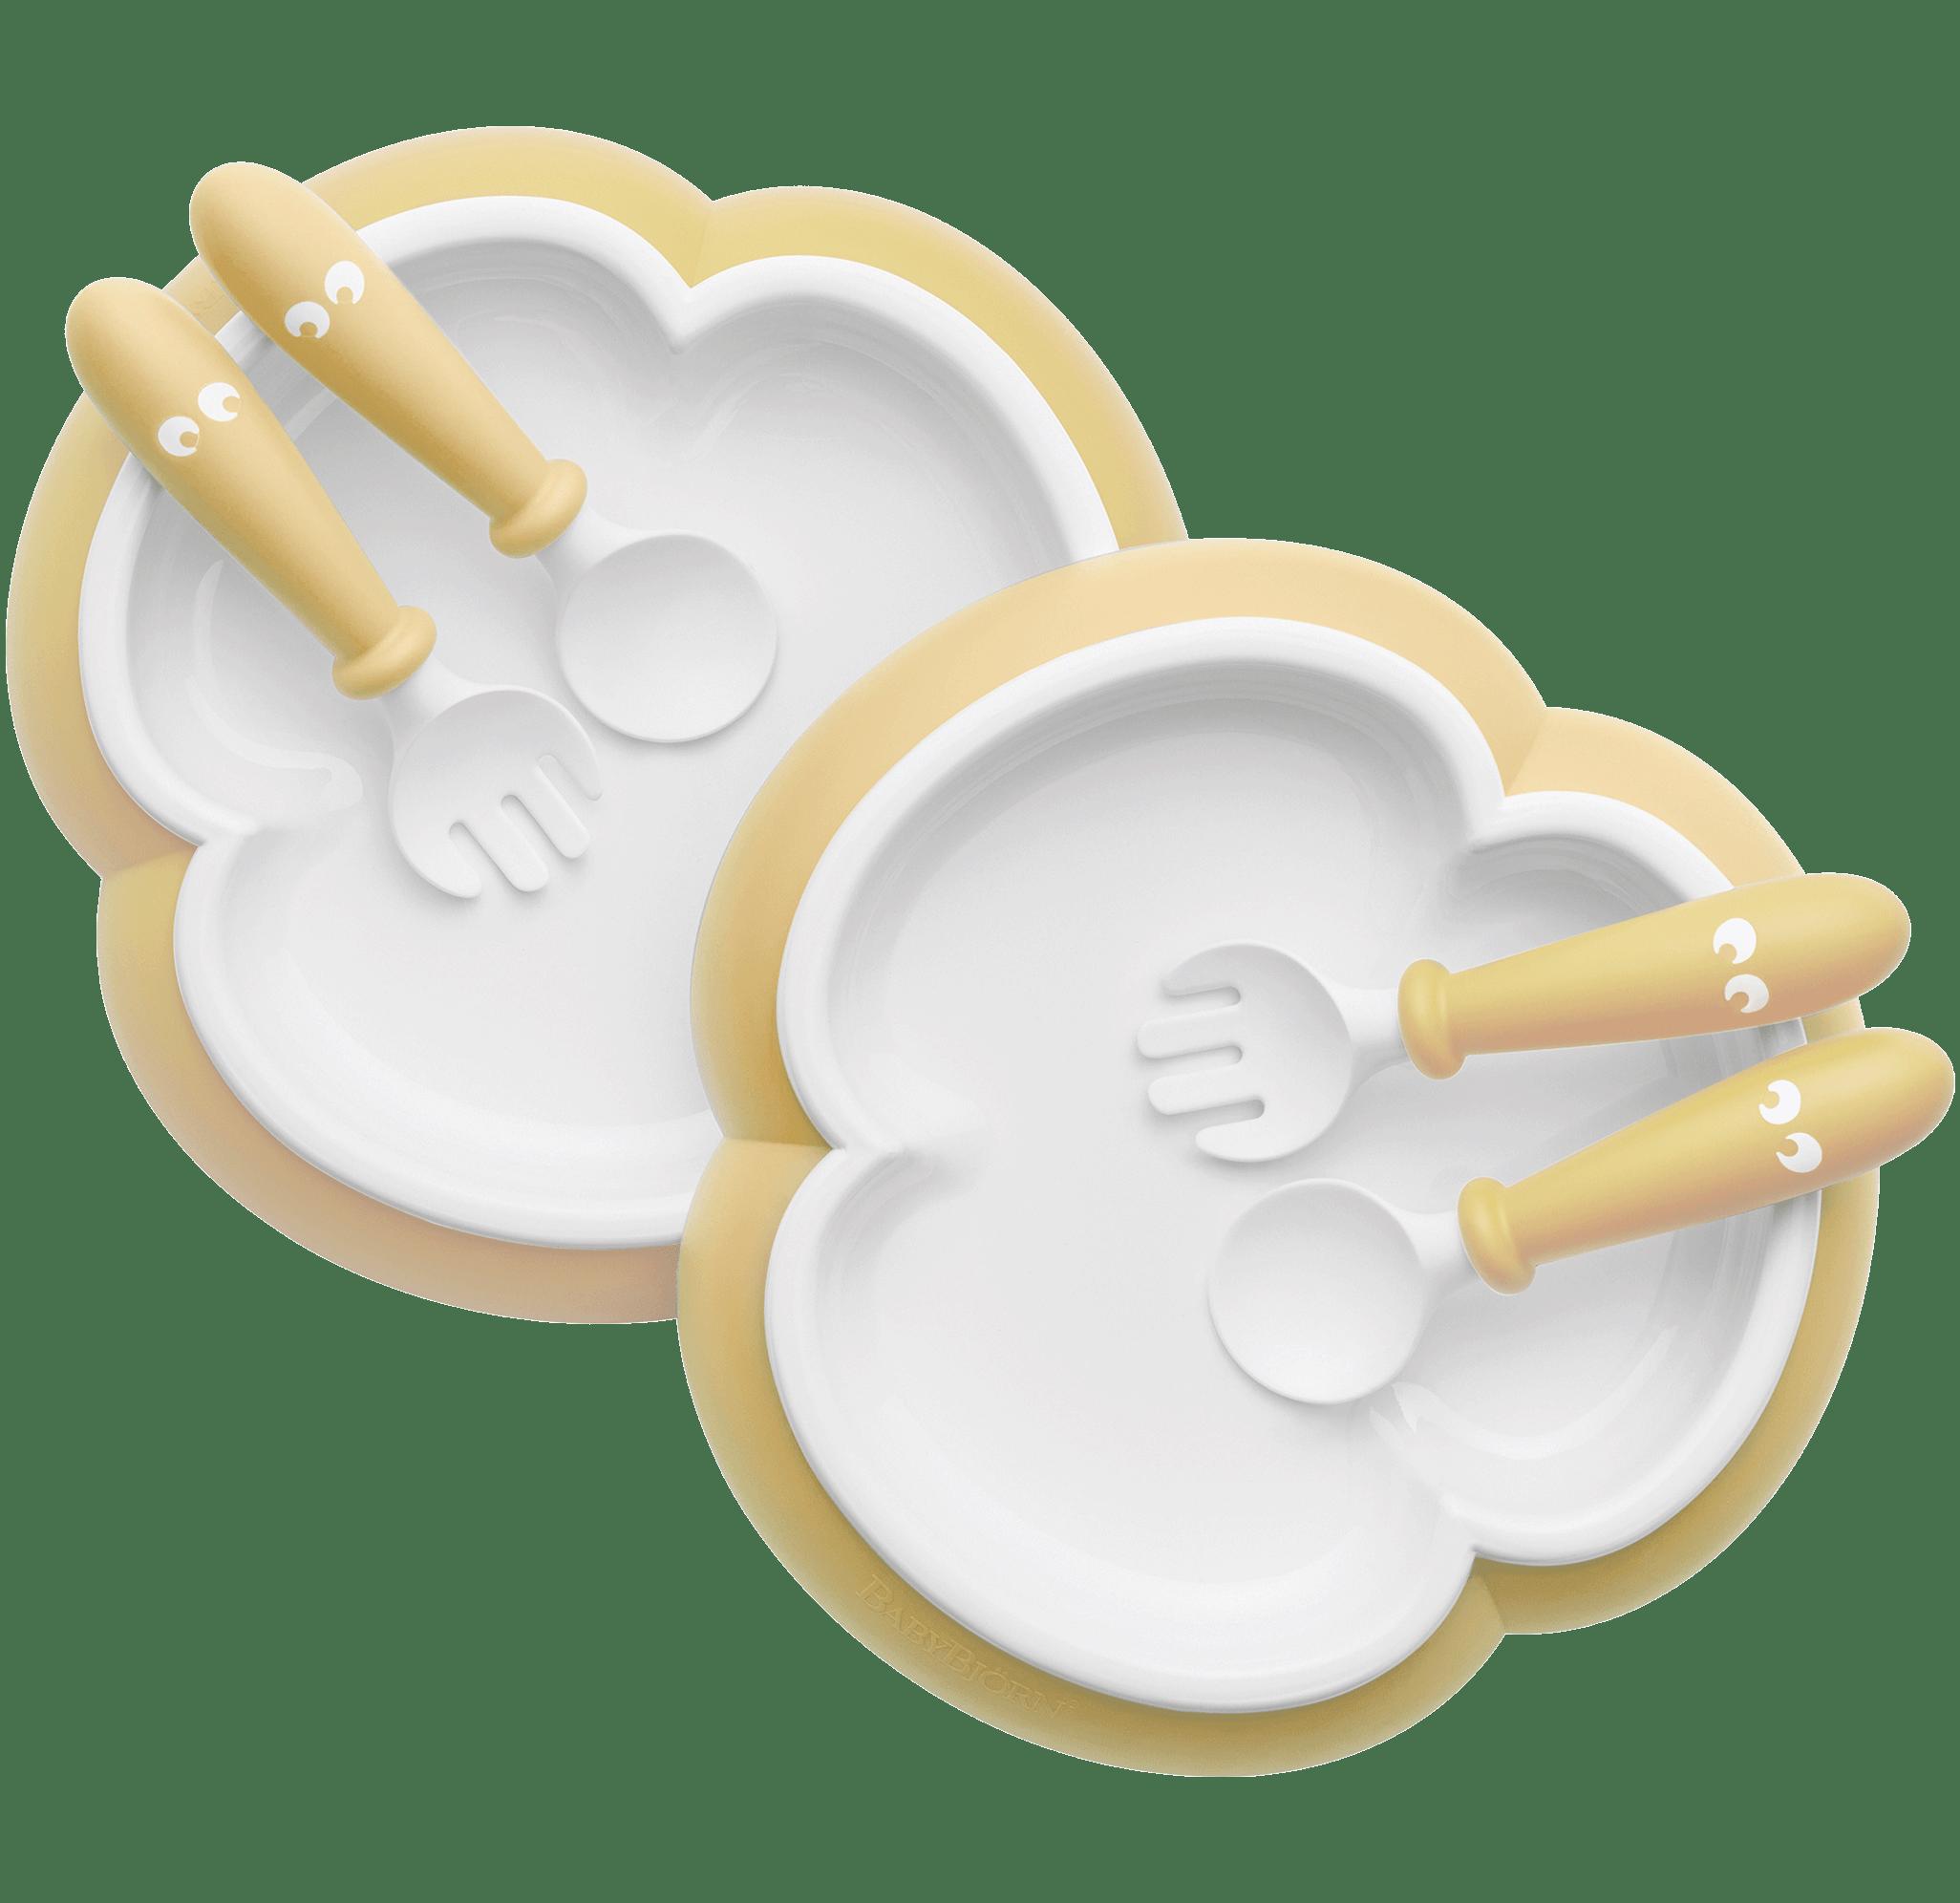 951b56dd5db Baby plate set including baby silverware